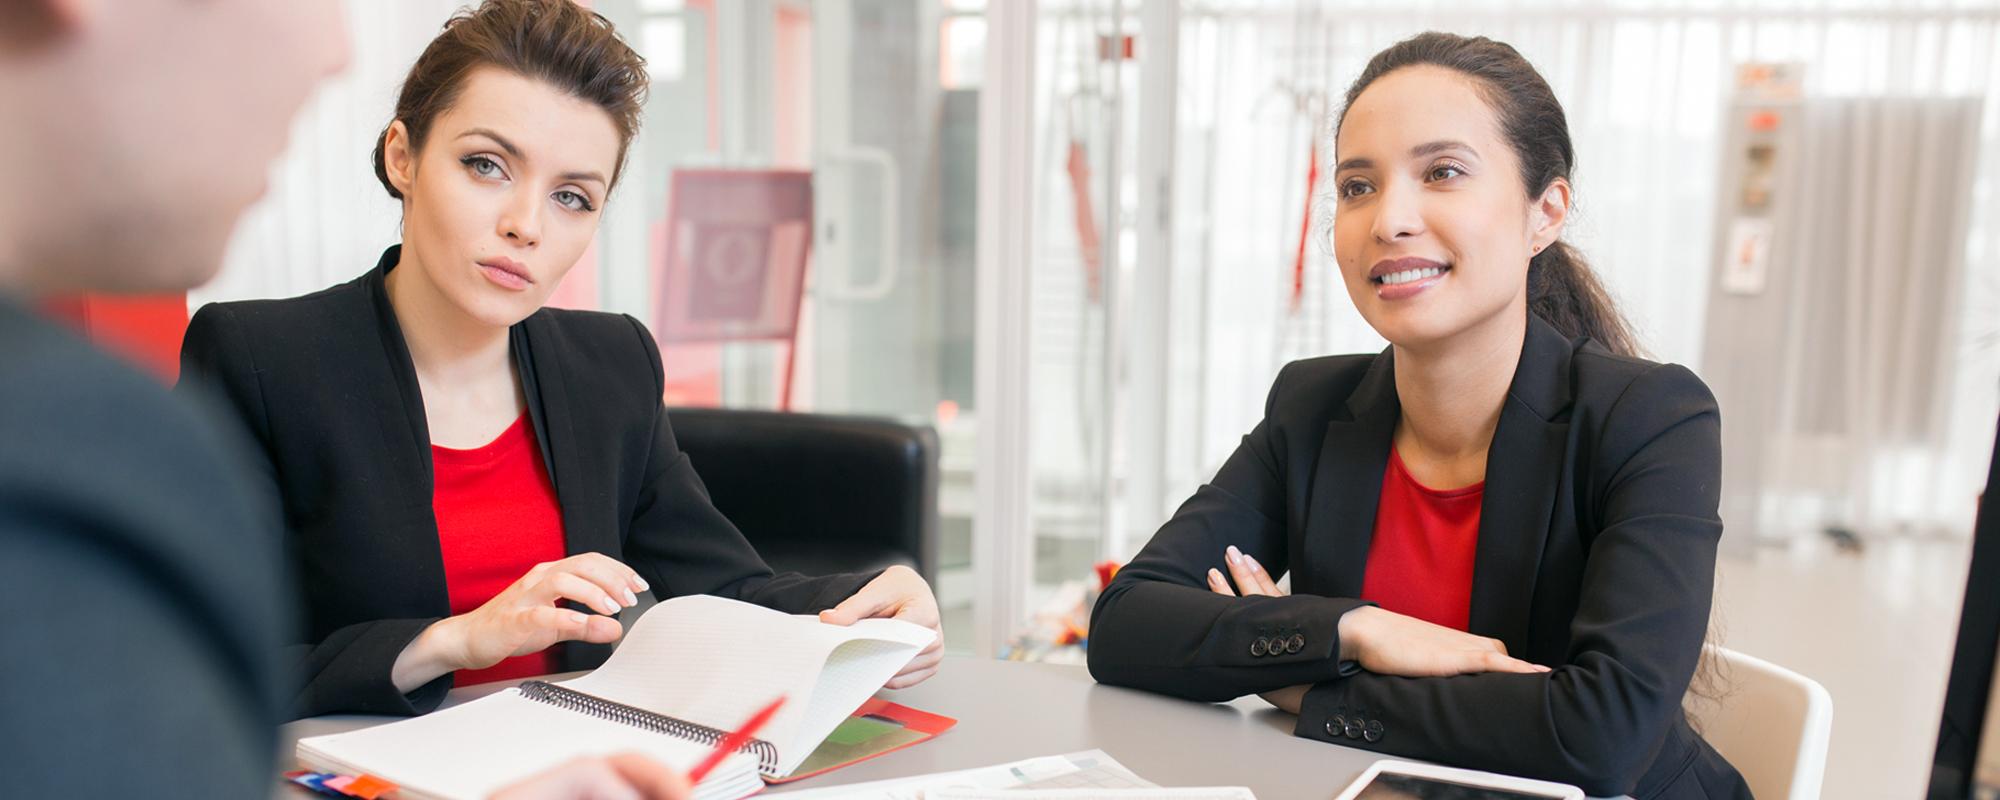 Post Graduate Diploma in Sales and Marketing Management offered by Westford University College, Dubai, Sharjah, Jeddah, Riyadh, UAE, KSA